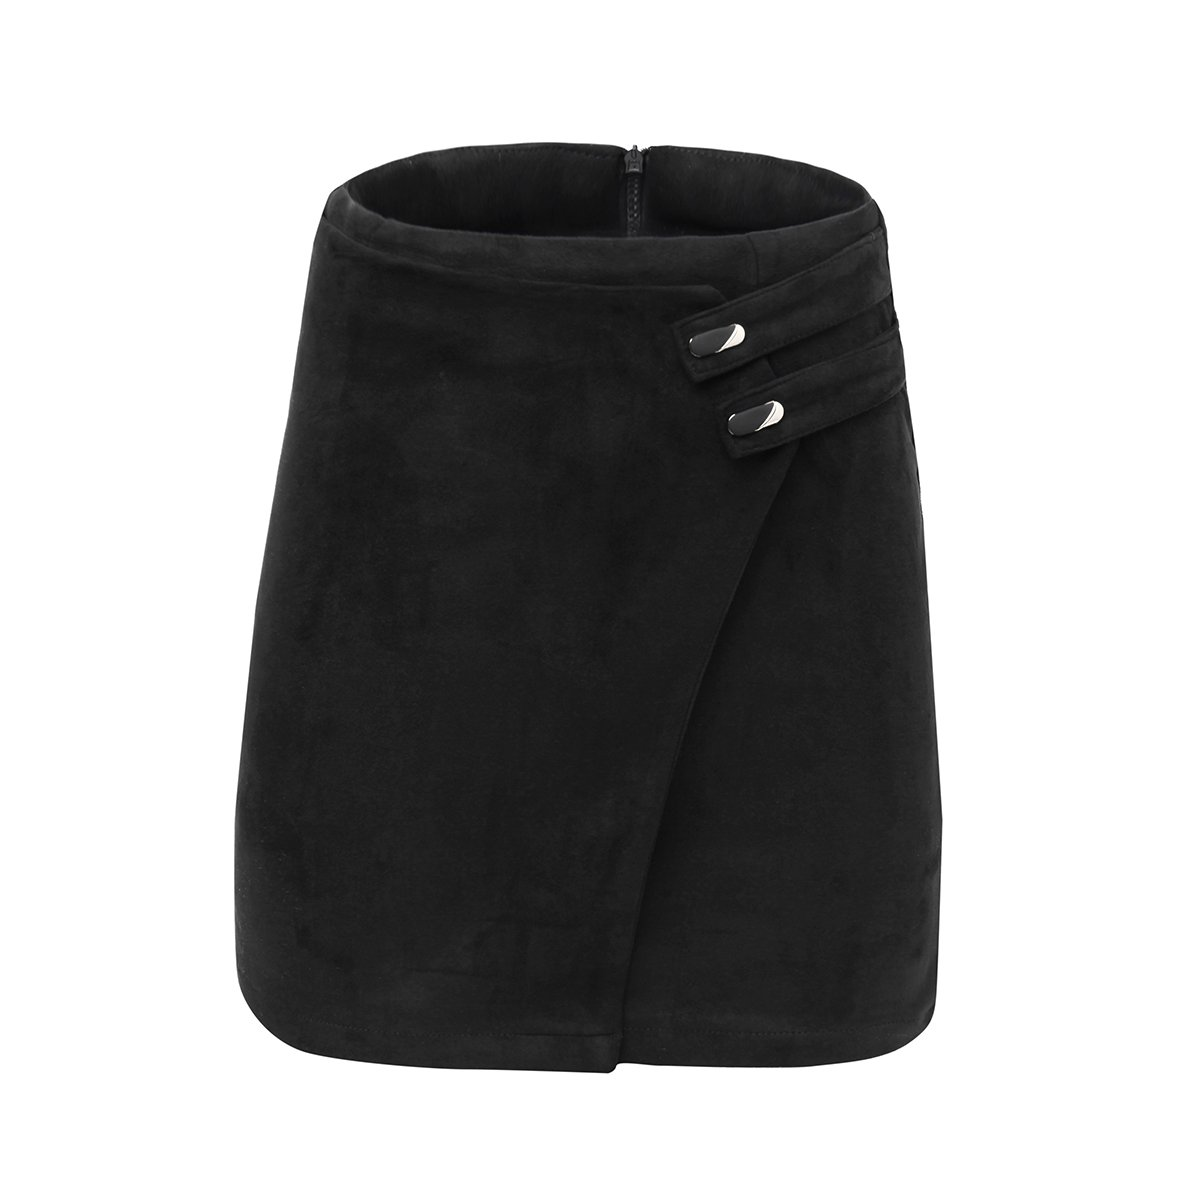 VKOOVIFA Women's High Waist Faux Suede Zipper Back A-Line Bodycon Short Mini Skirts Black Small